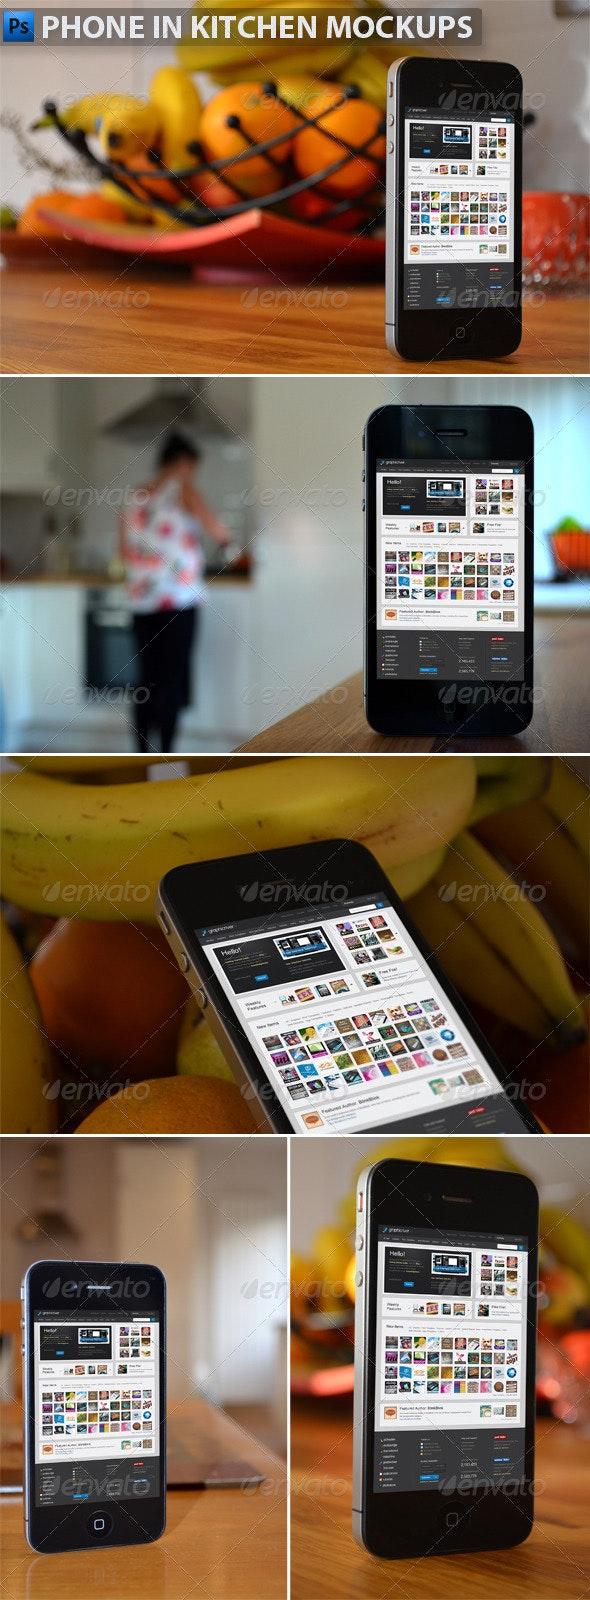 Phone in Kitchen Mock-Ups - Mobile Displays